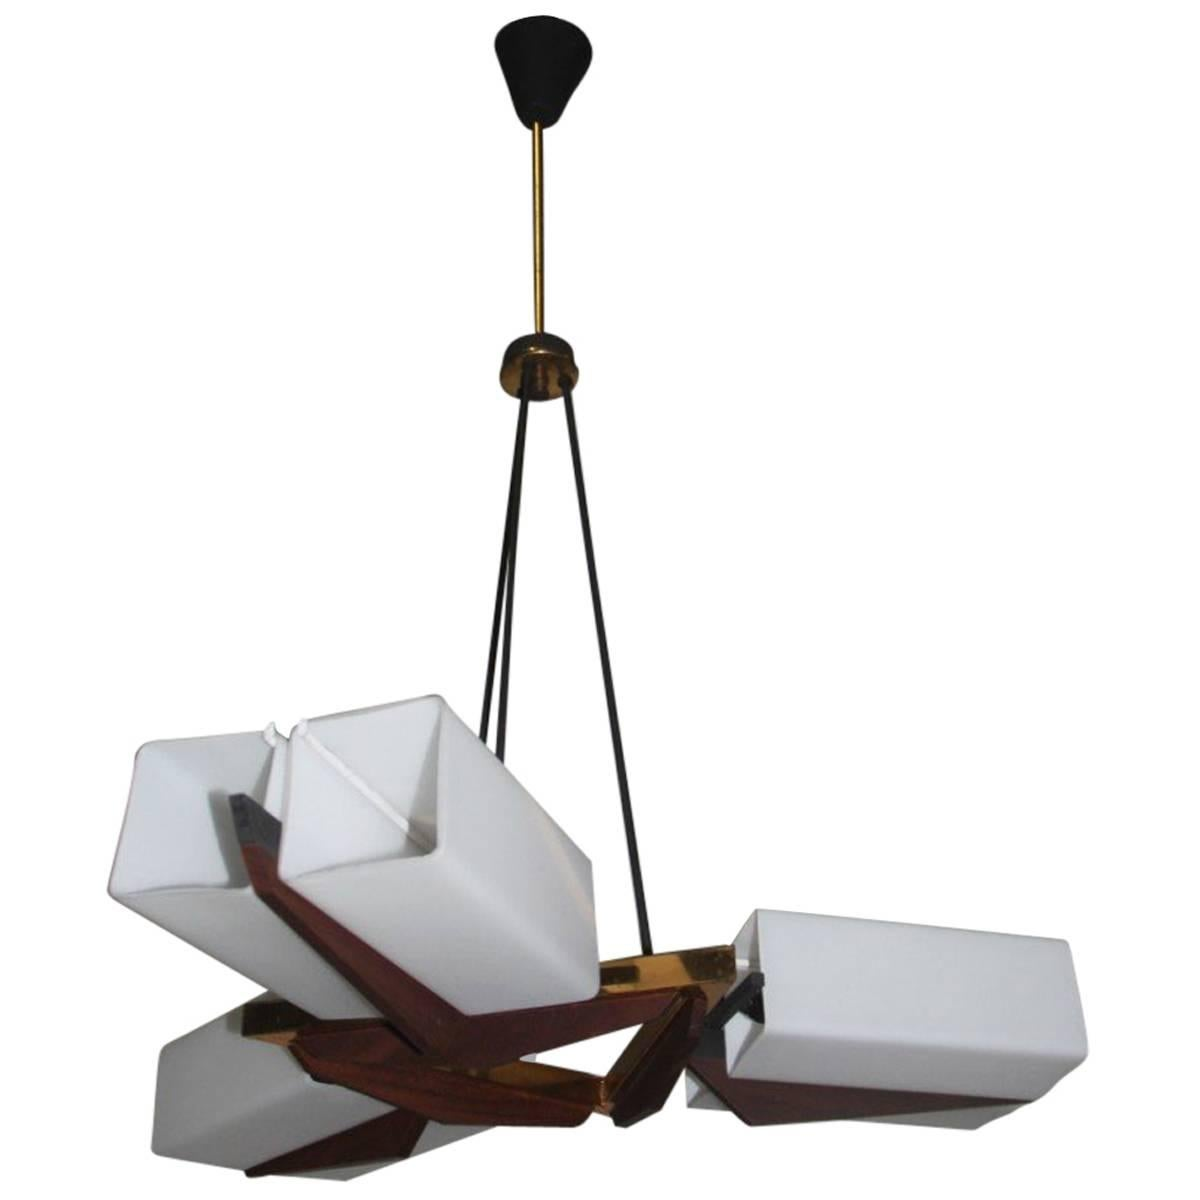 Bruno Chiarini Chandelier, Italian Design Brass Murano Glass Mid-Century Modern